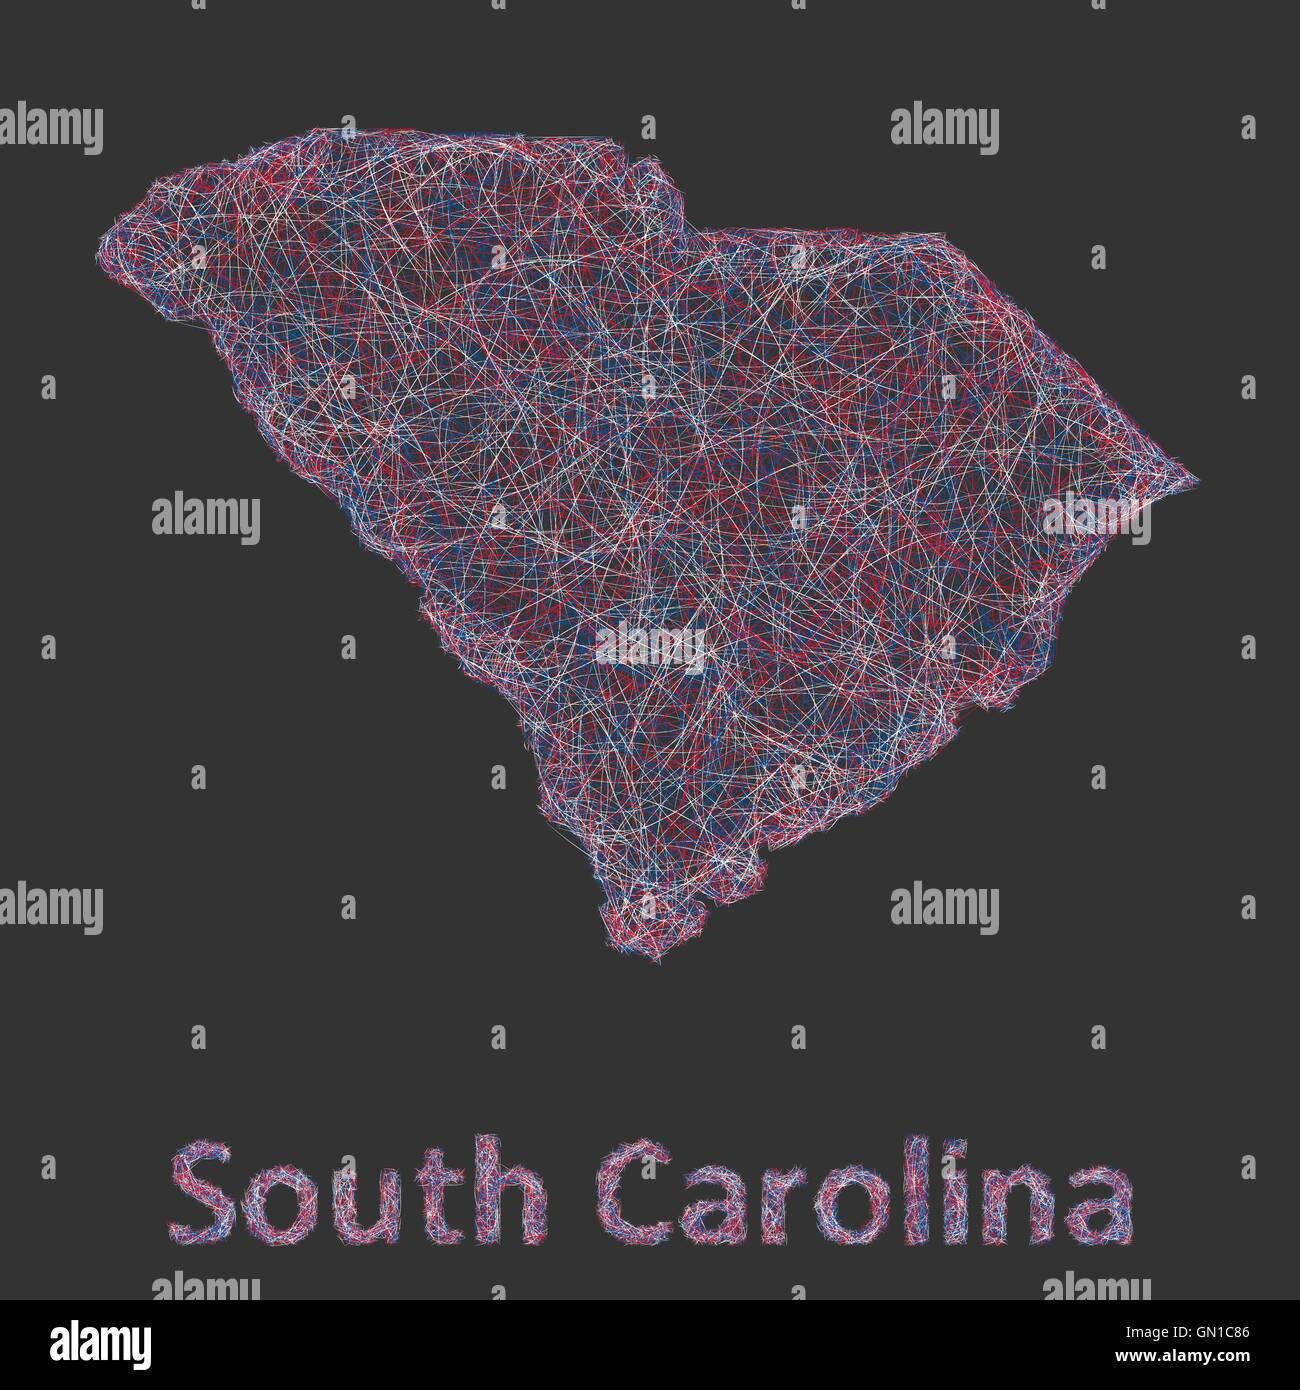 South Carolina line art map Stock Vector Art Illustration